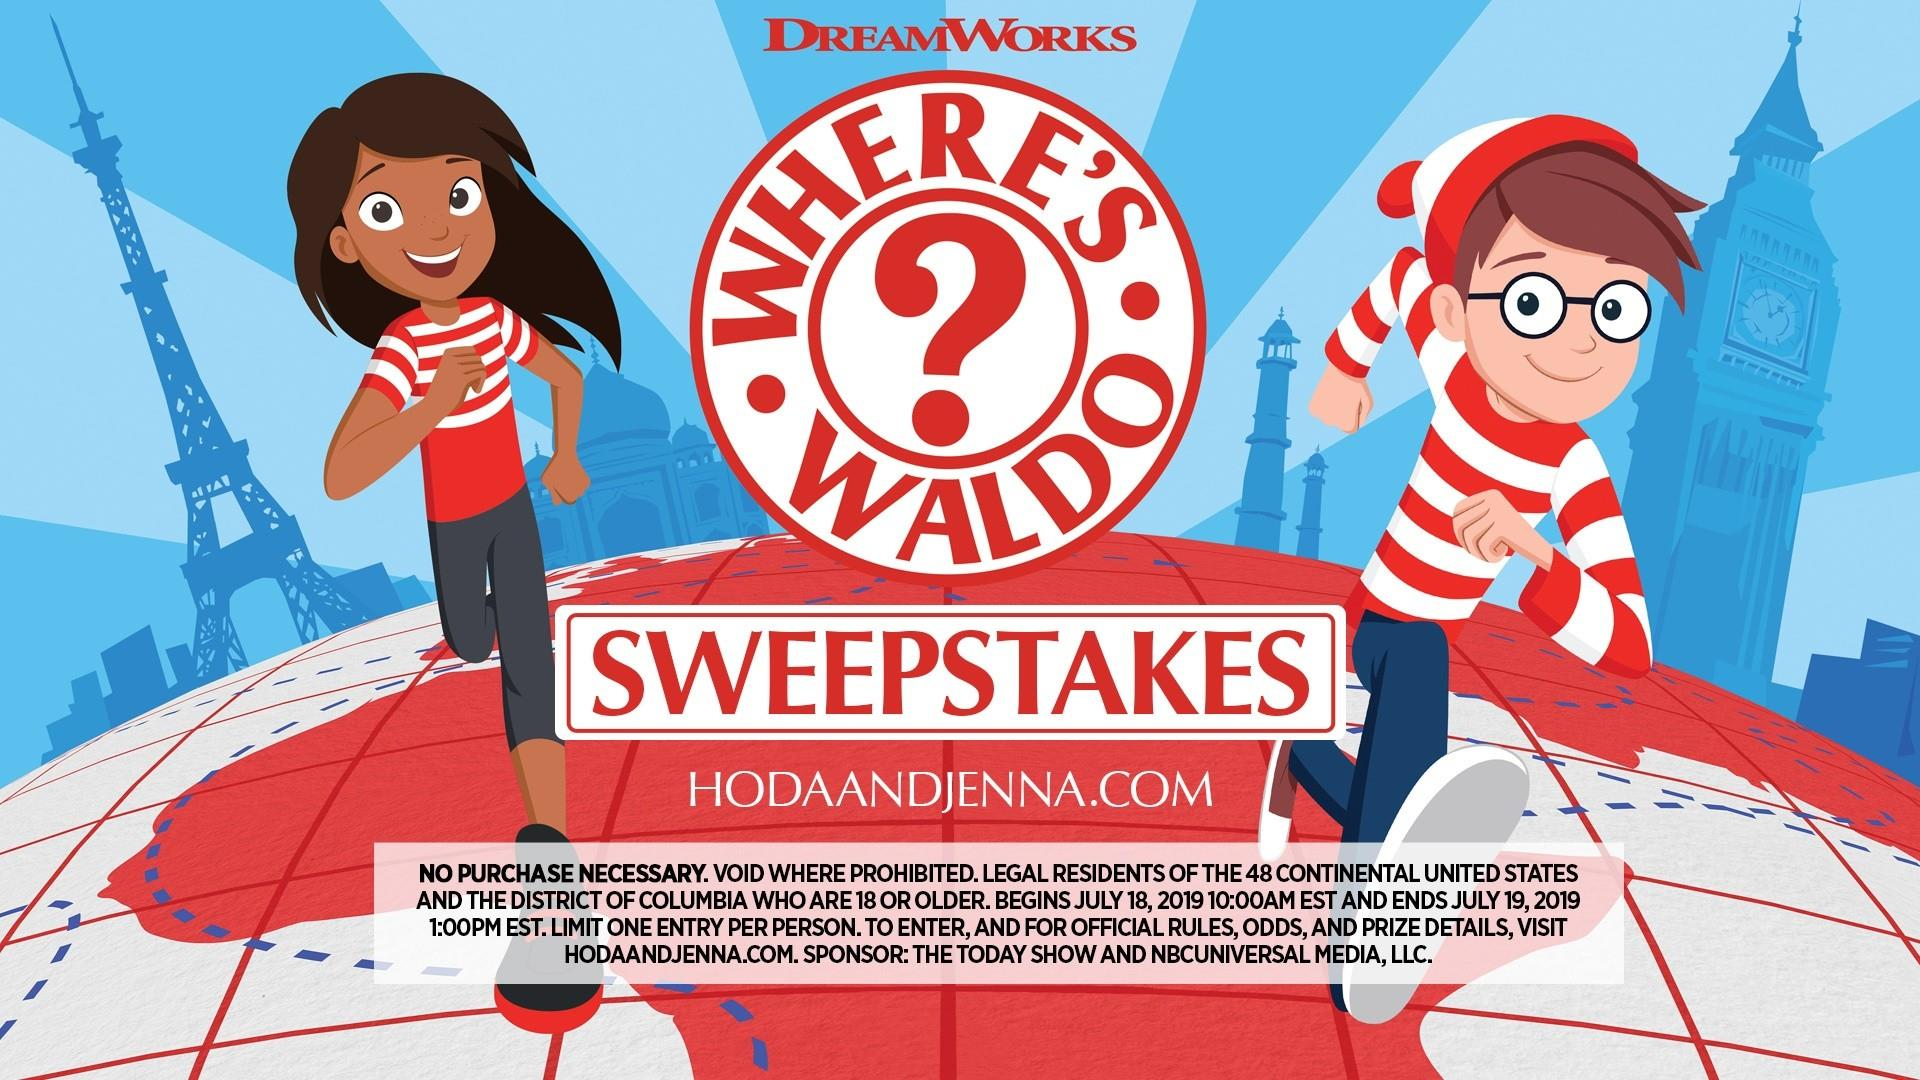 Enter our Where's Waldo sweepstakes for a chance to go to Orlando